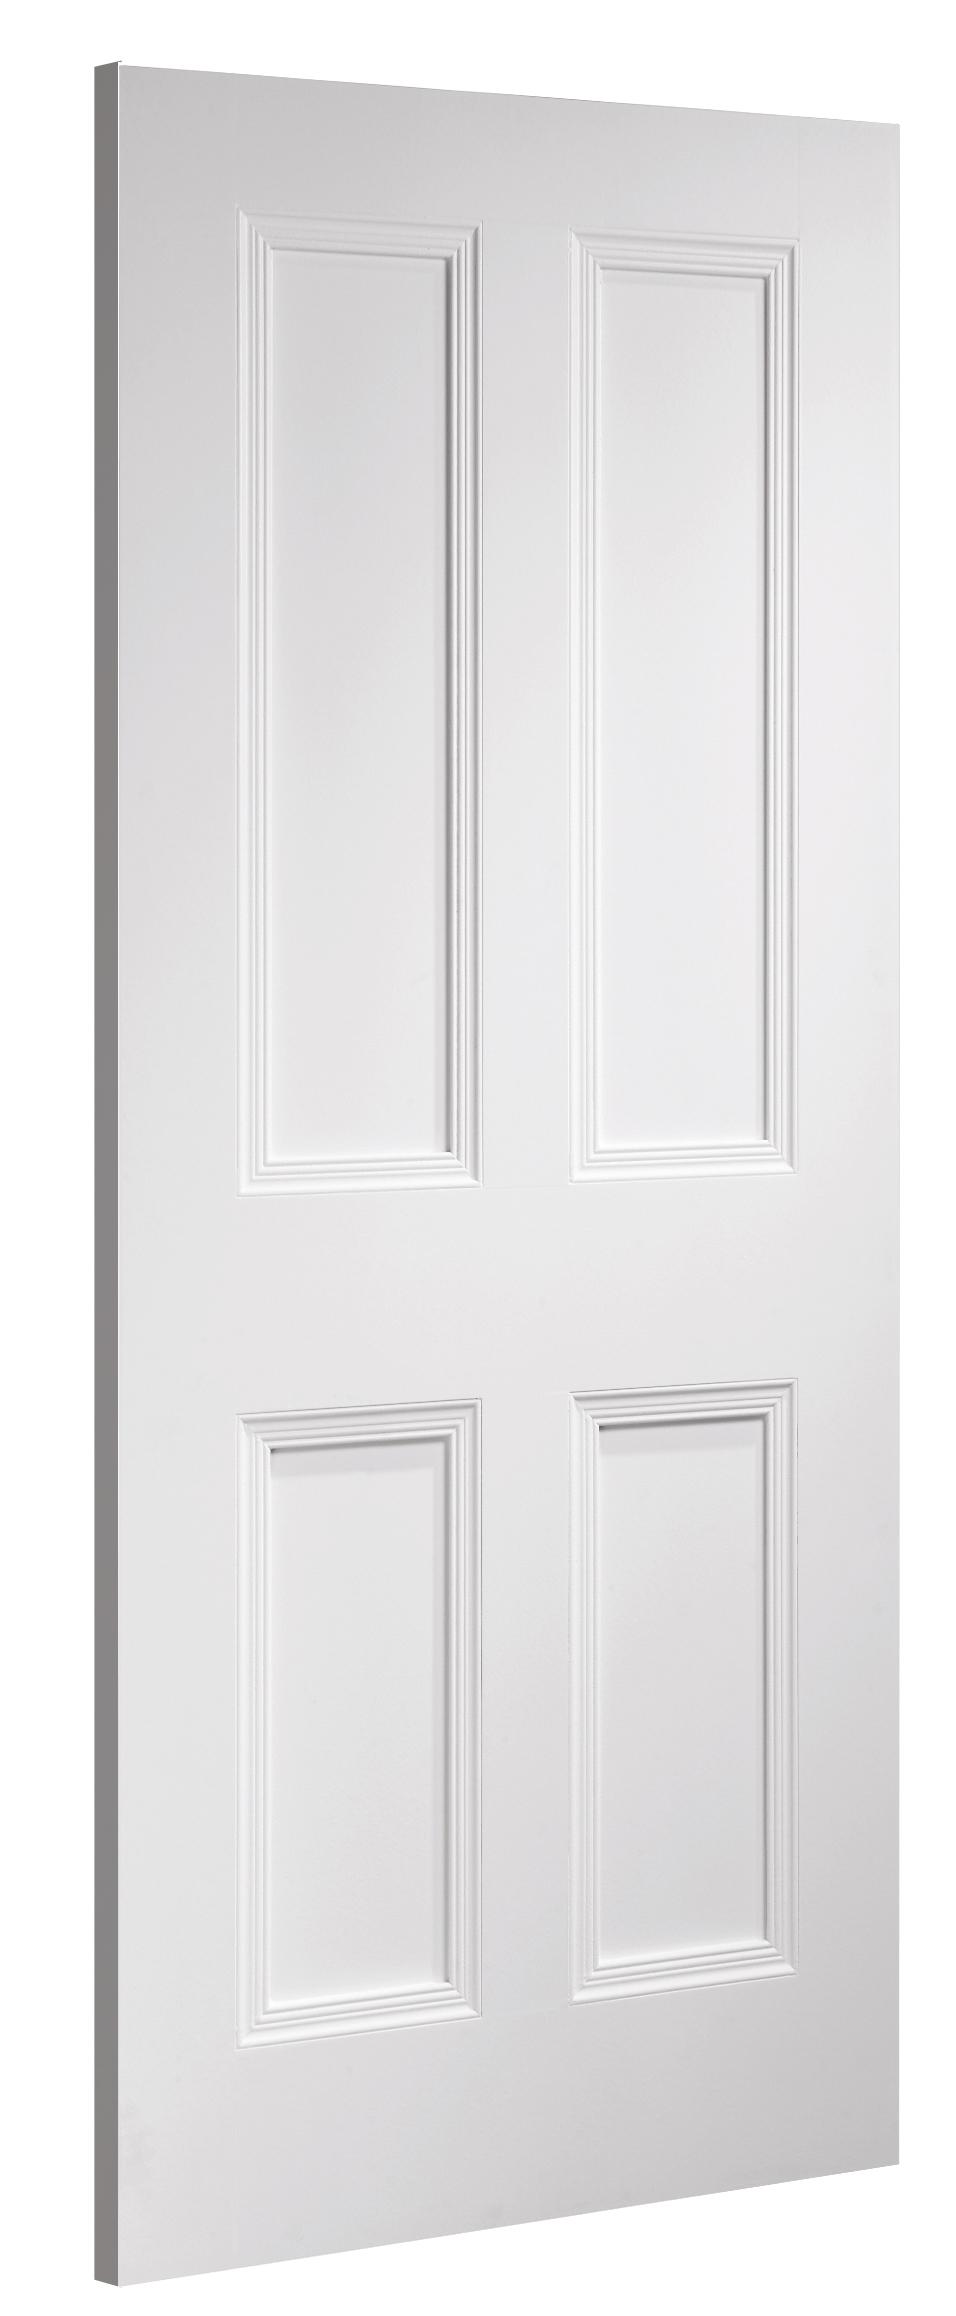 Primed Doors NM1